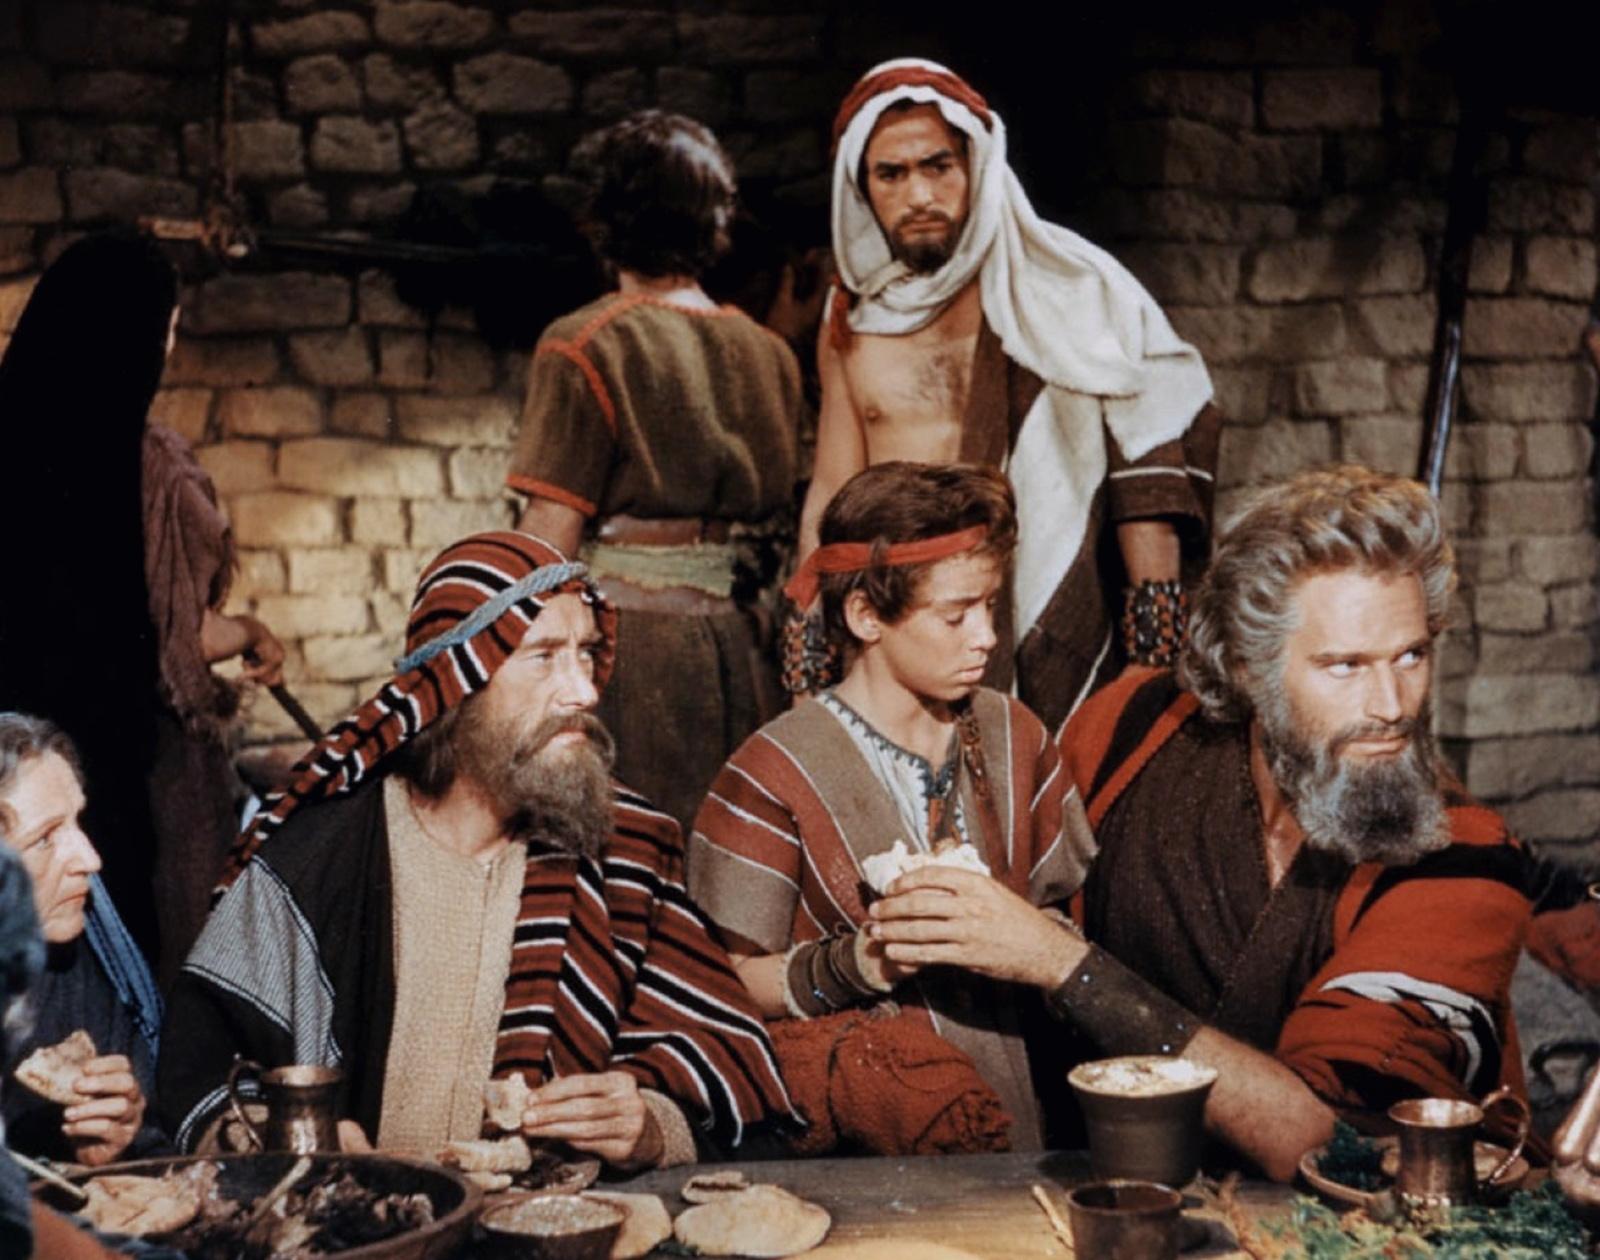 Charlton Heston in The Ten Commandments with (L to R) John Carradine, John Derek, Eugene Mazzola, Charlton Heston